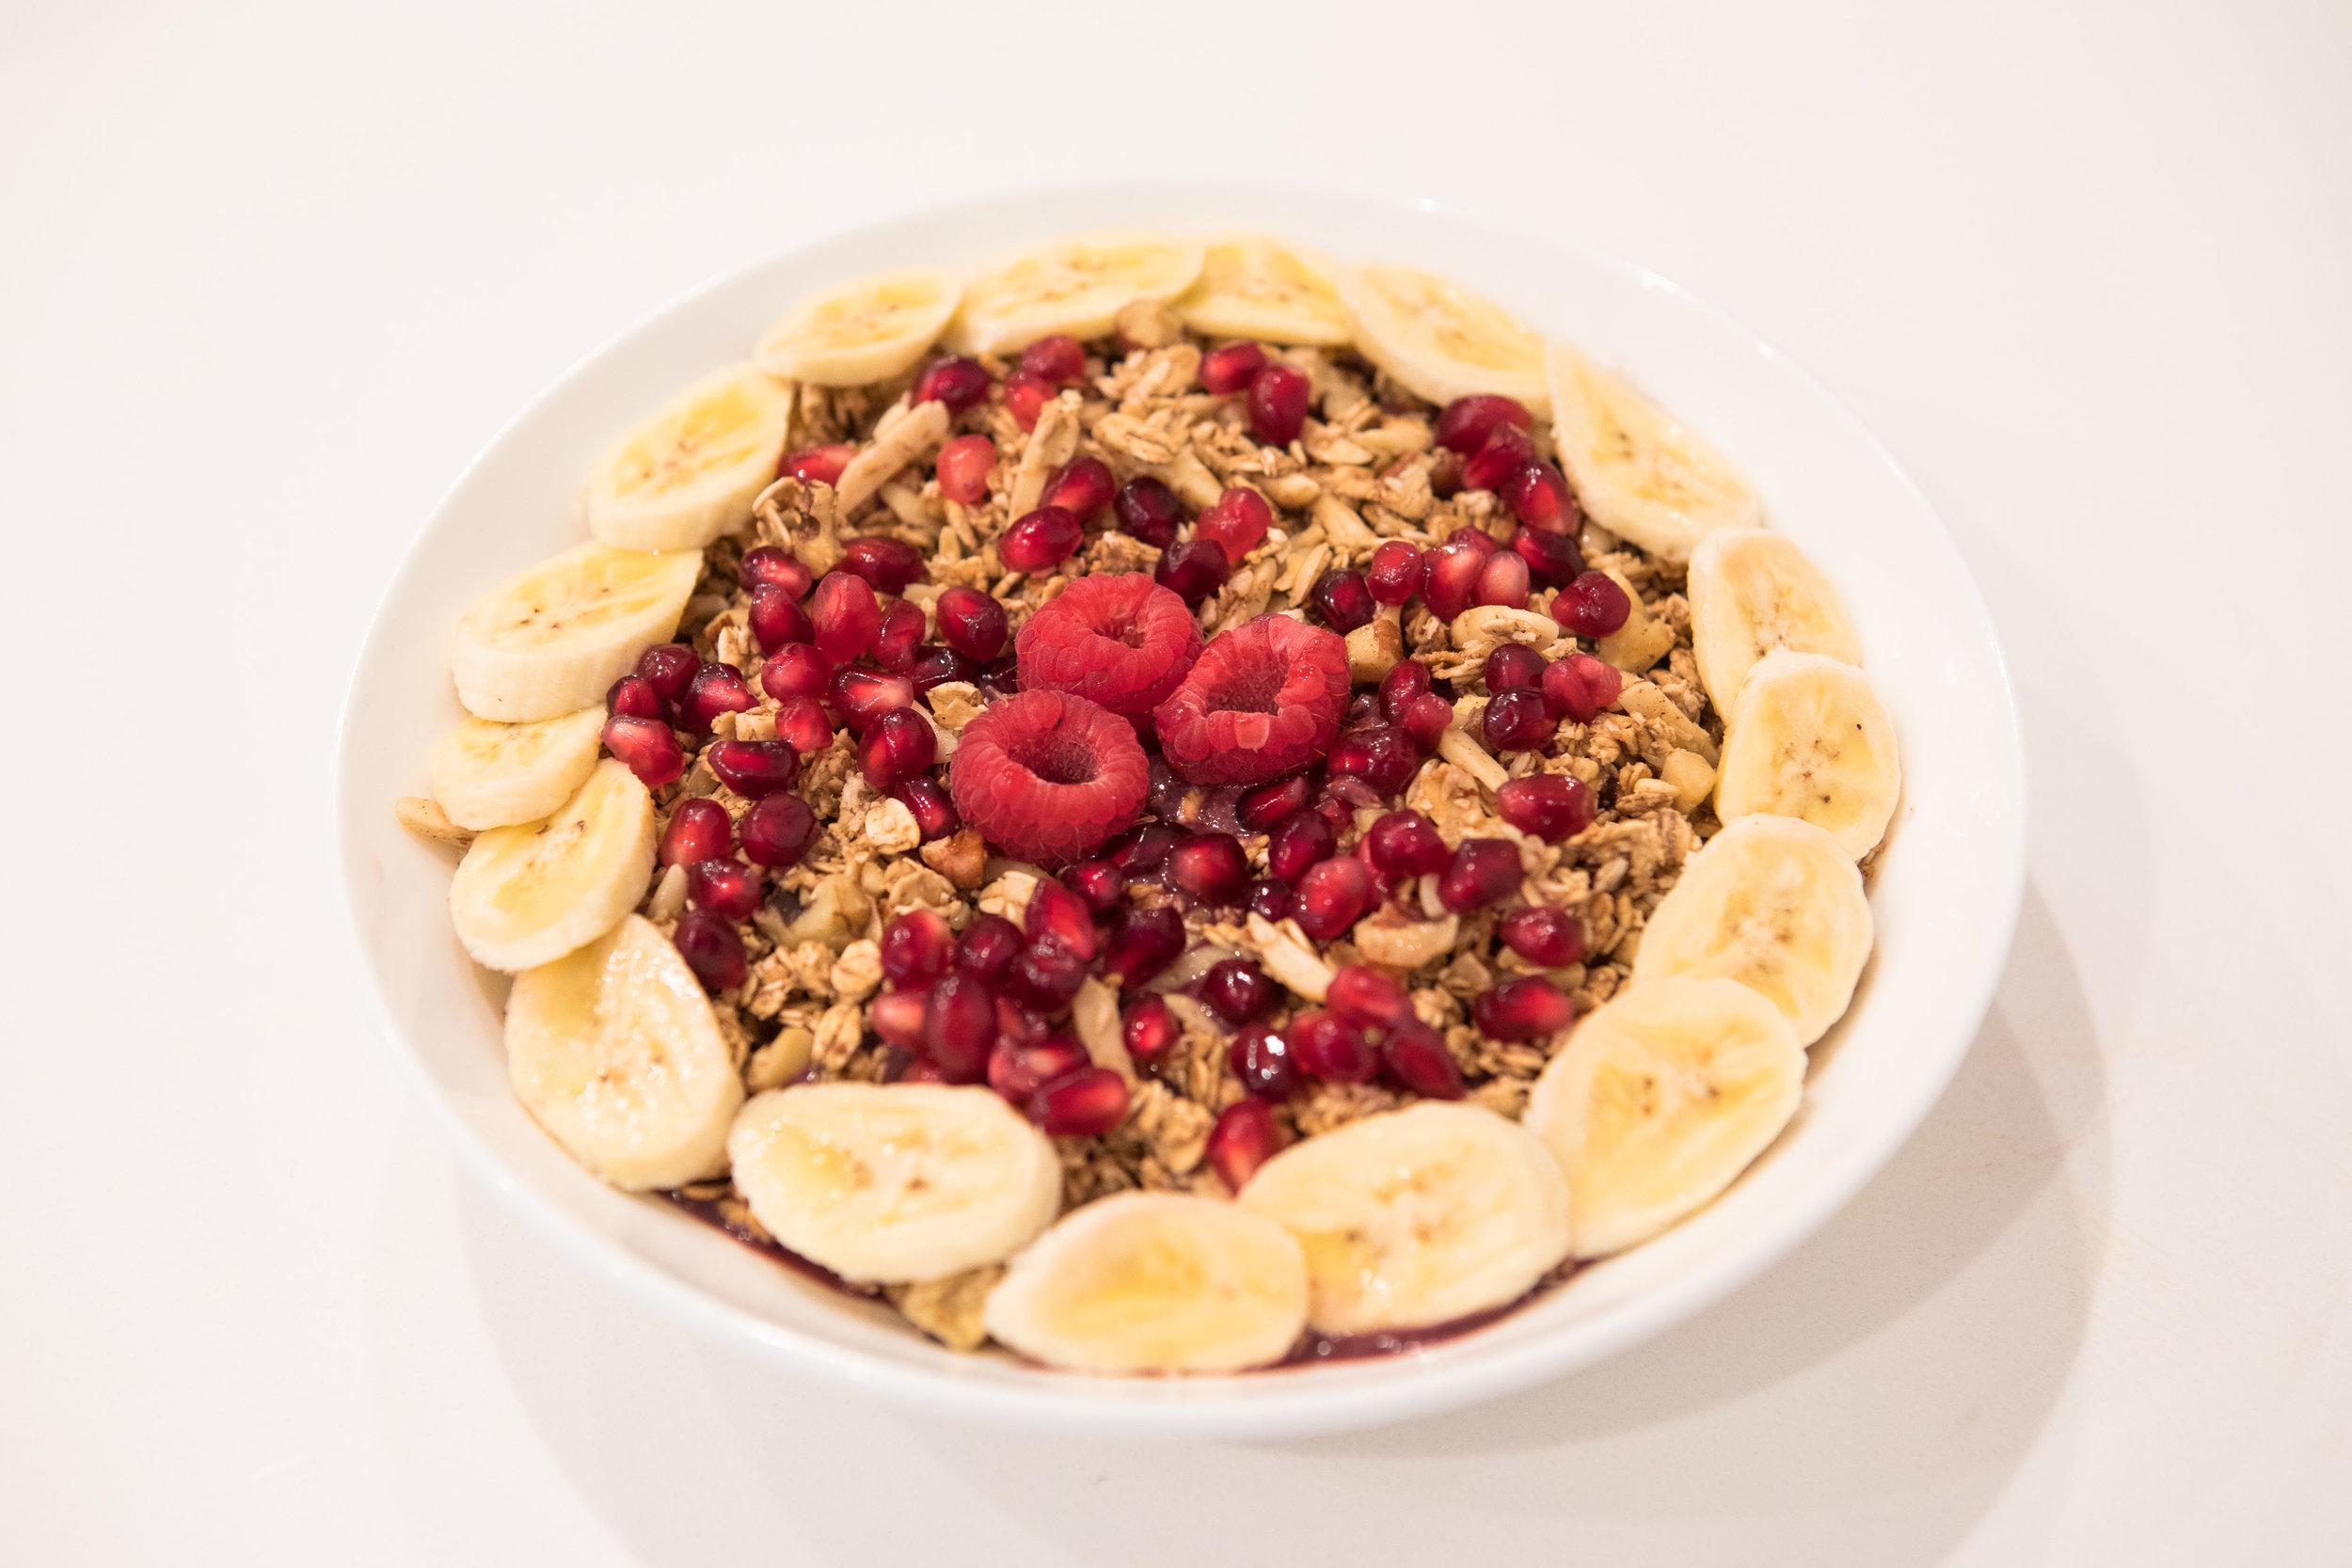 Maka-vegan-gluten-free-cafe-fresh-breakfast-bowl.jpg